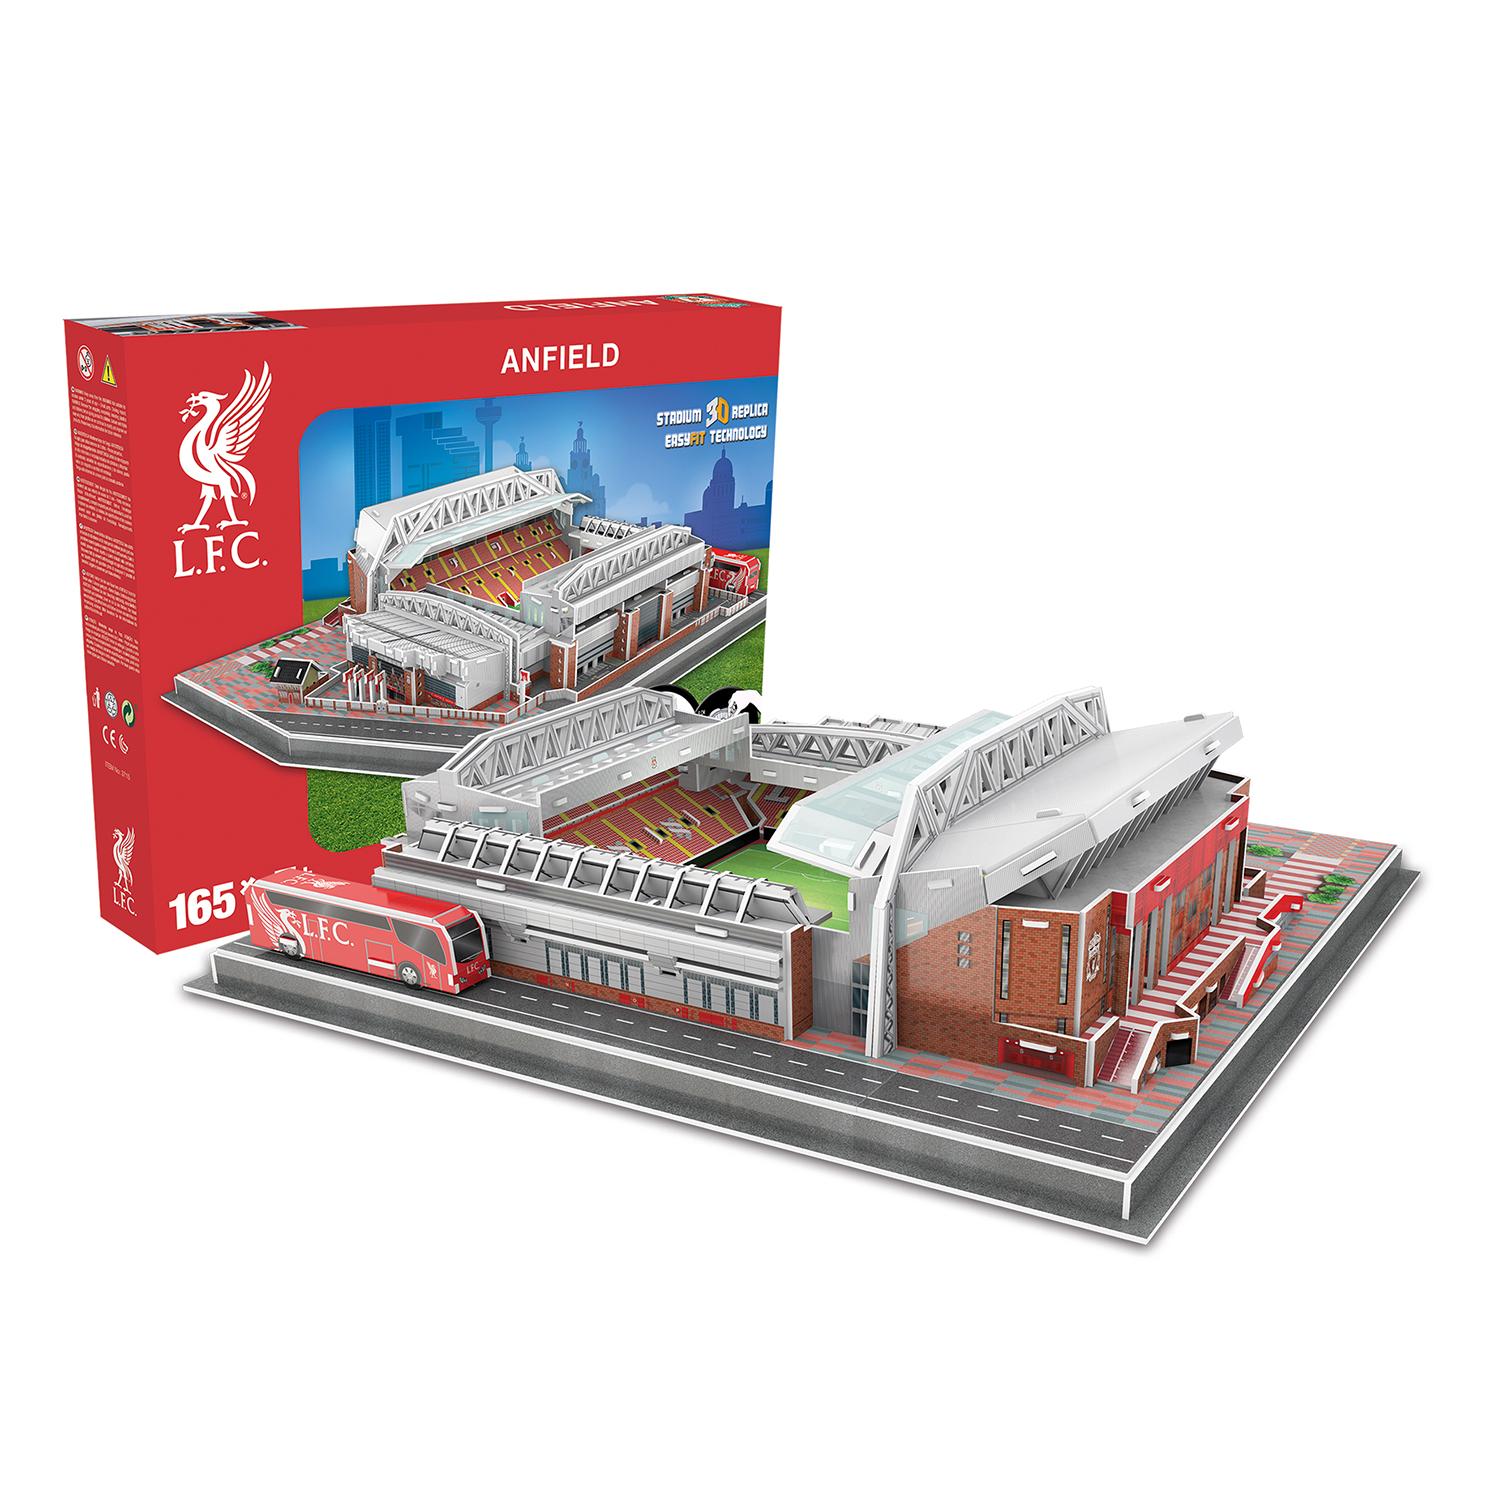 Paul Lamond Games – Liverpool Anfield Stadium 3D Puzzle